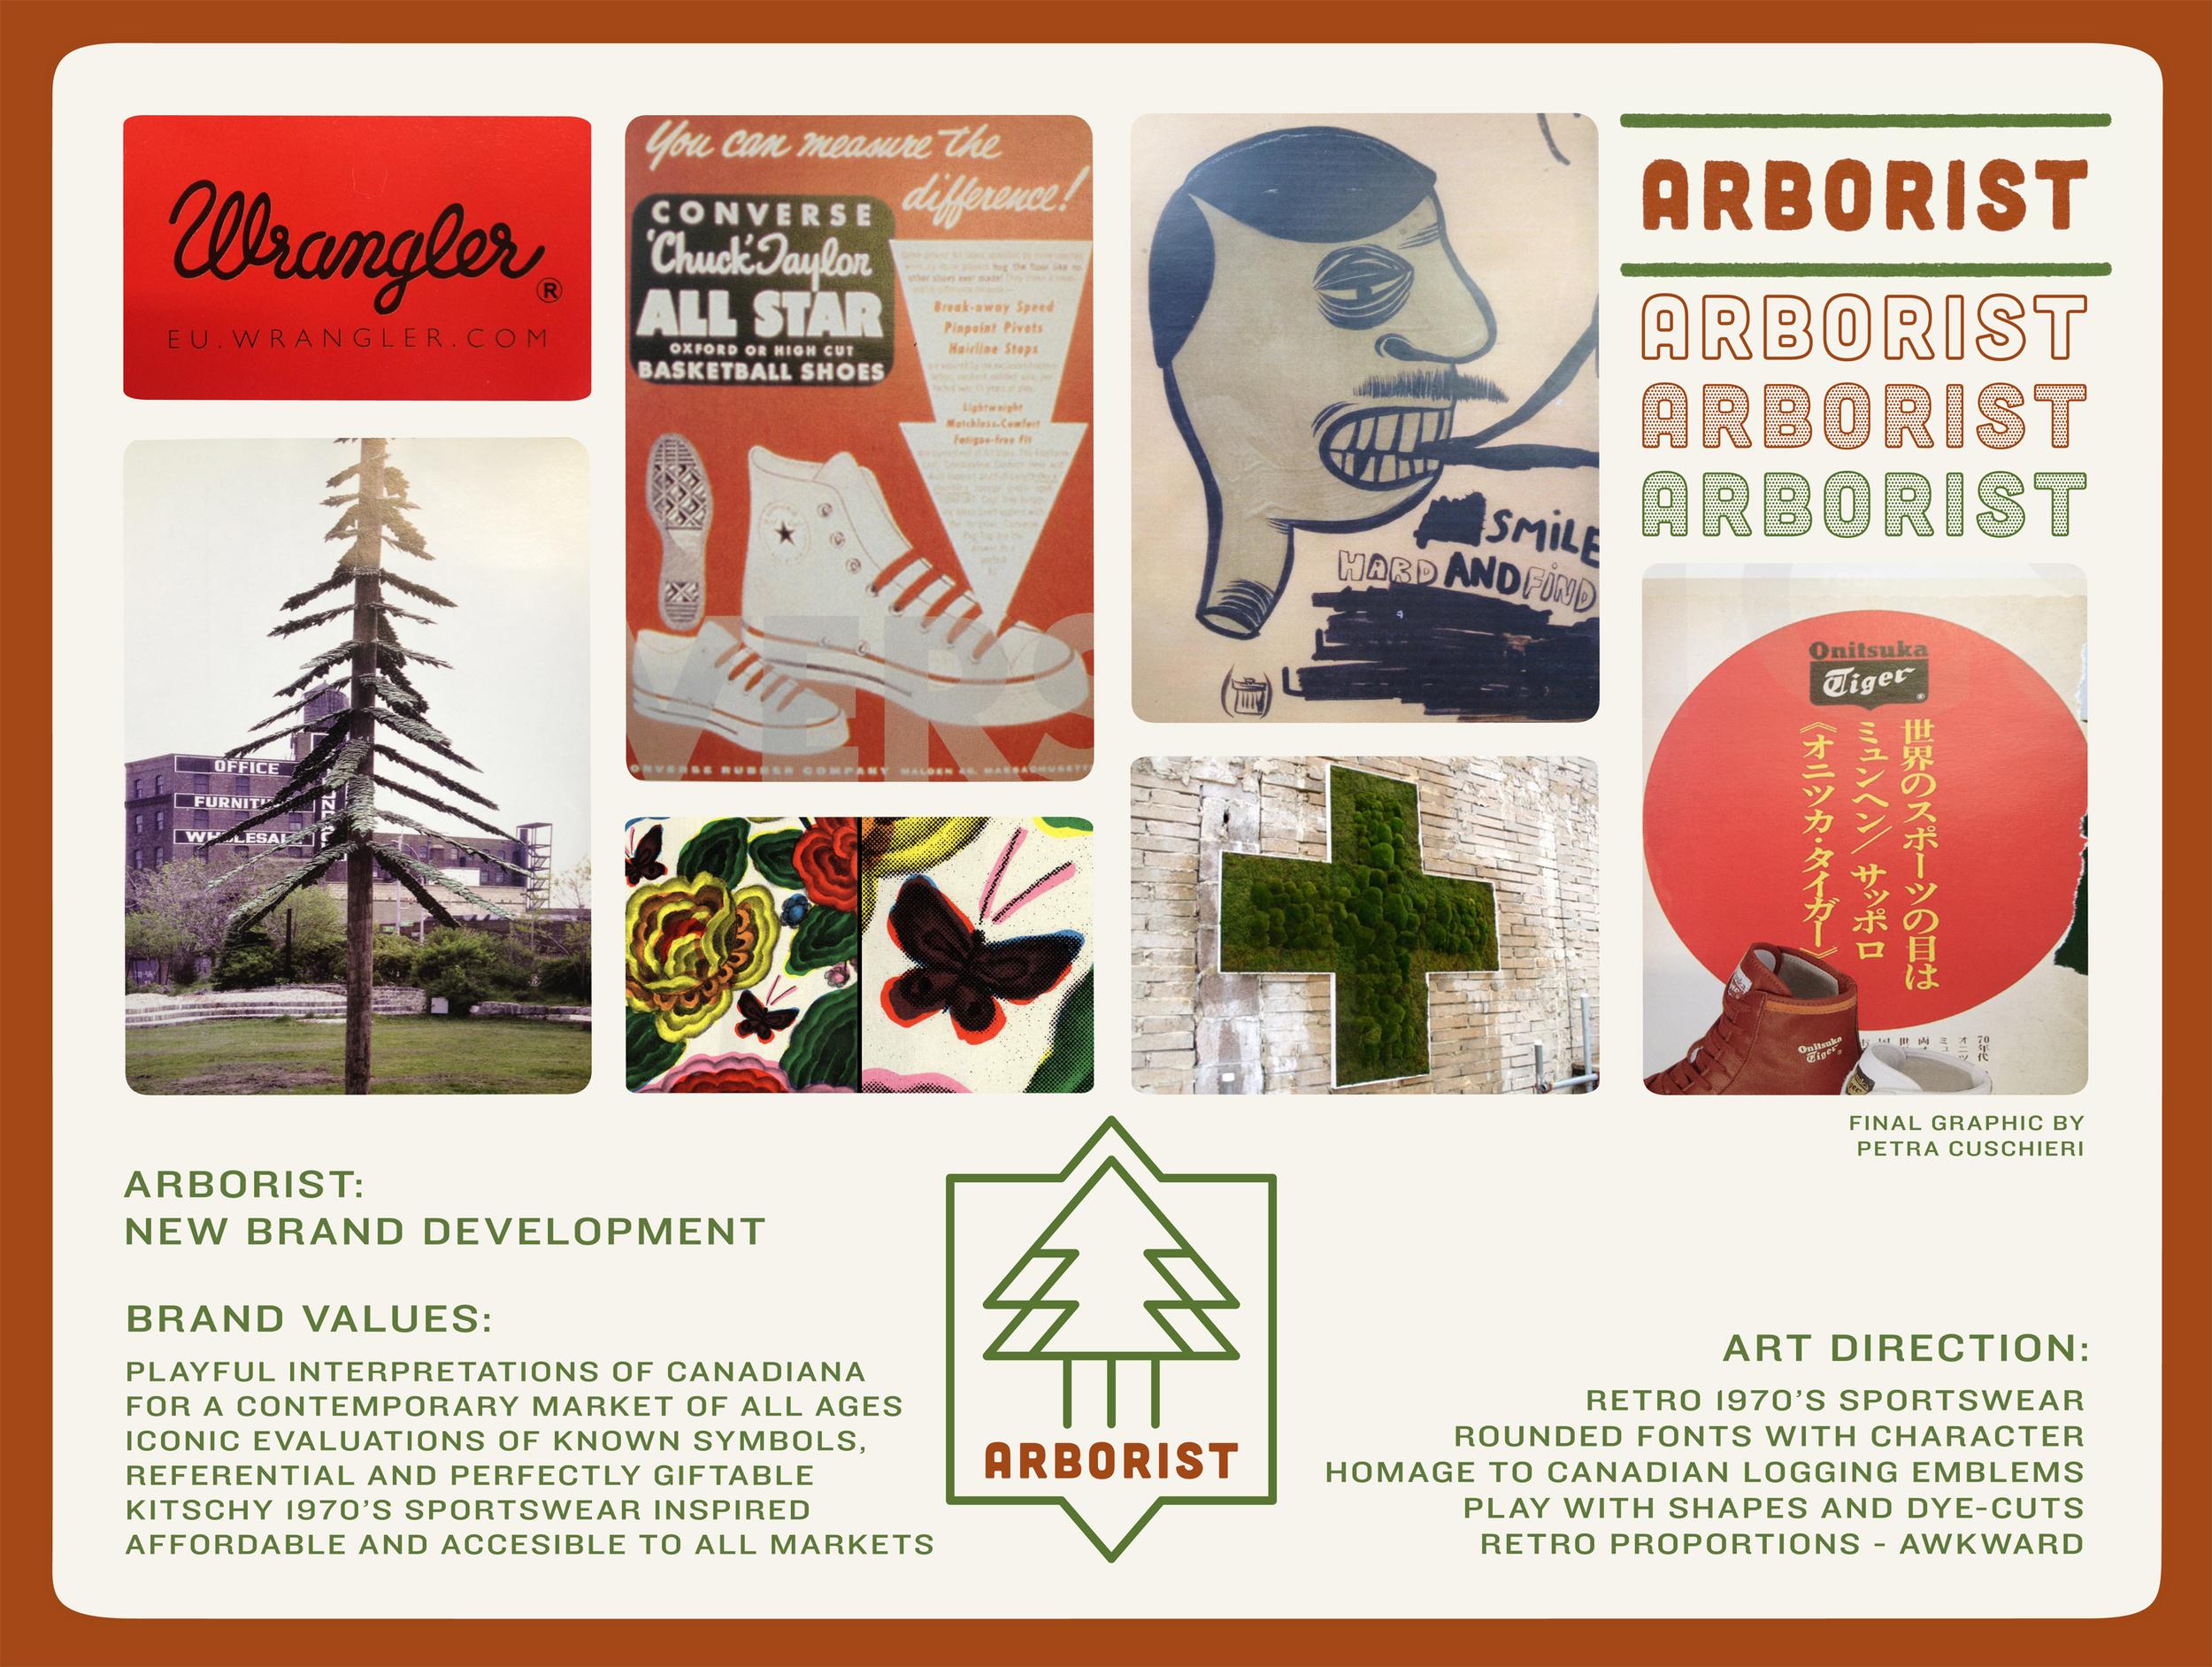 Arborist-Art Direction-WEB.jpg